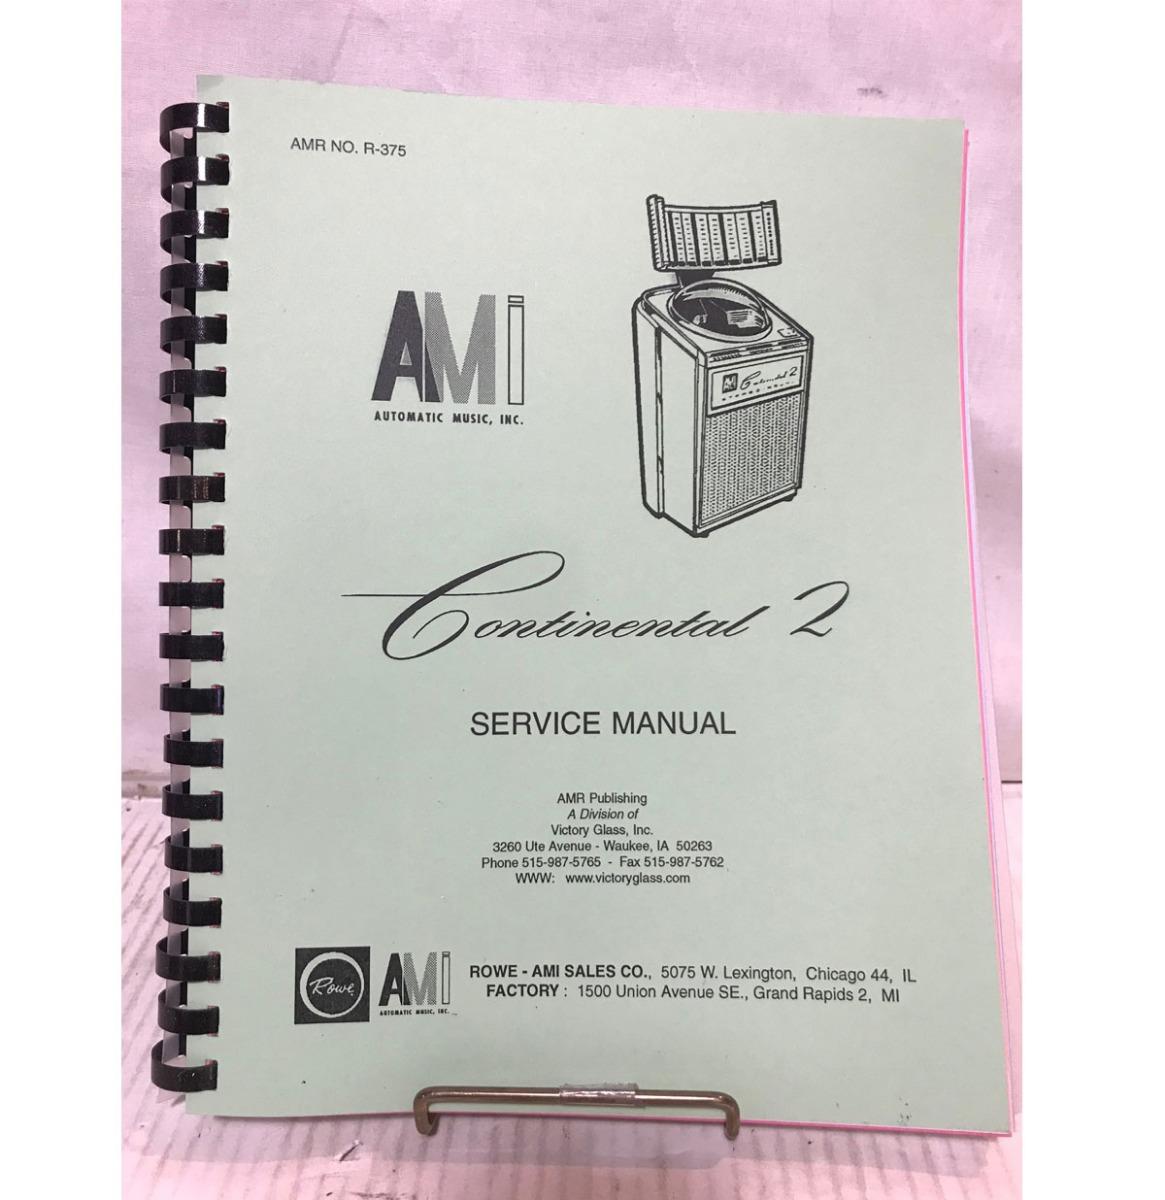 AMI Continental 2 Jukebox Service Manual